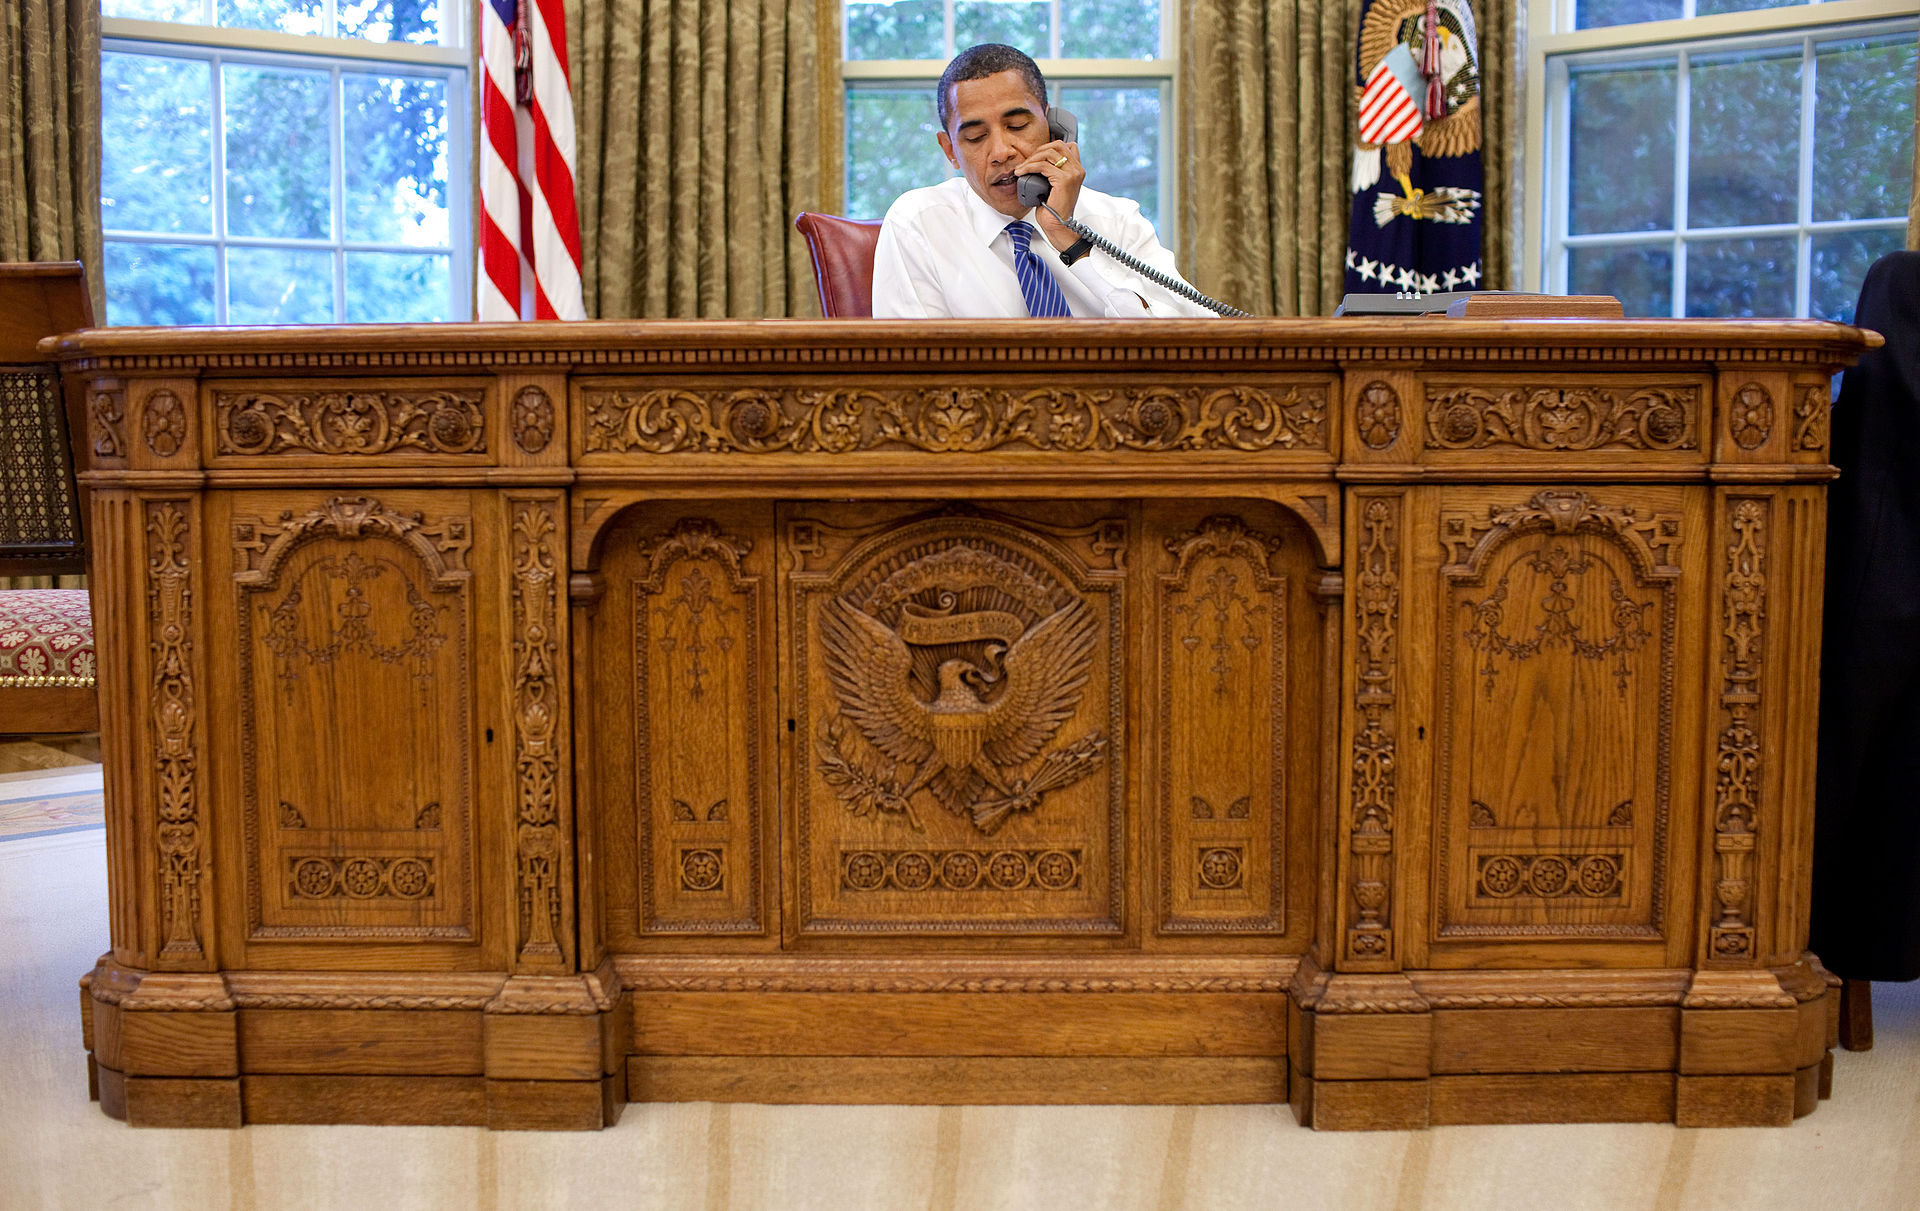 Obama Oval Office resolute desk